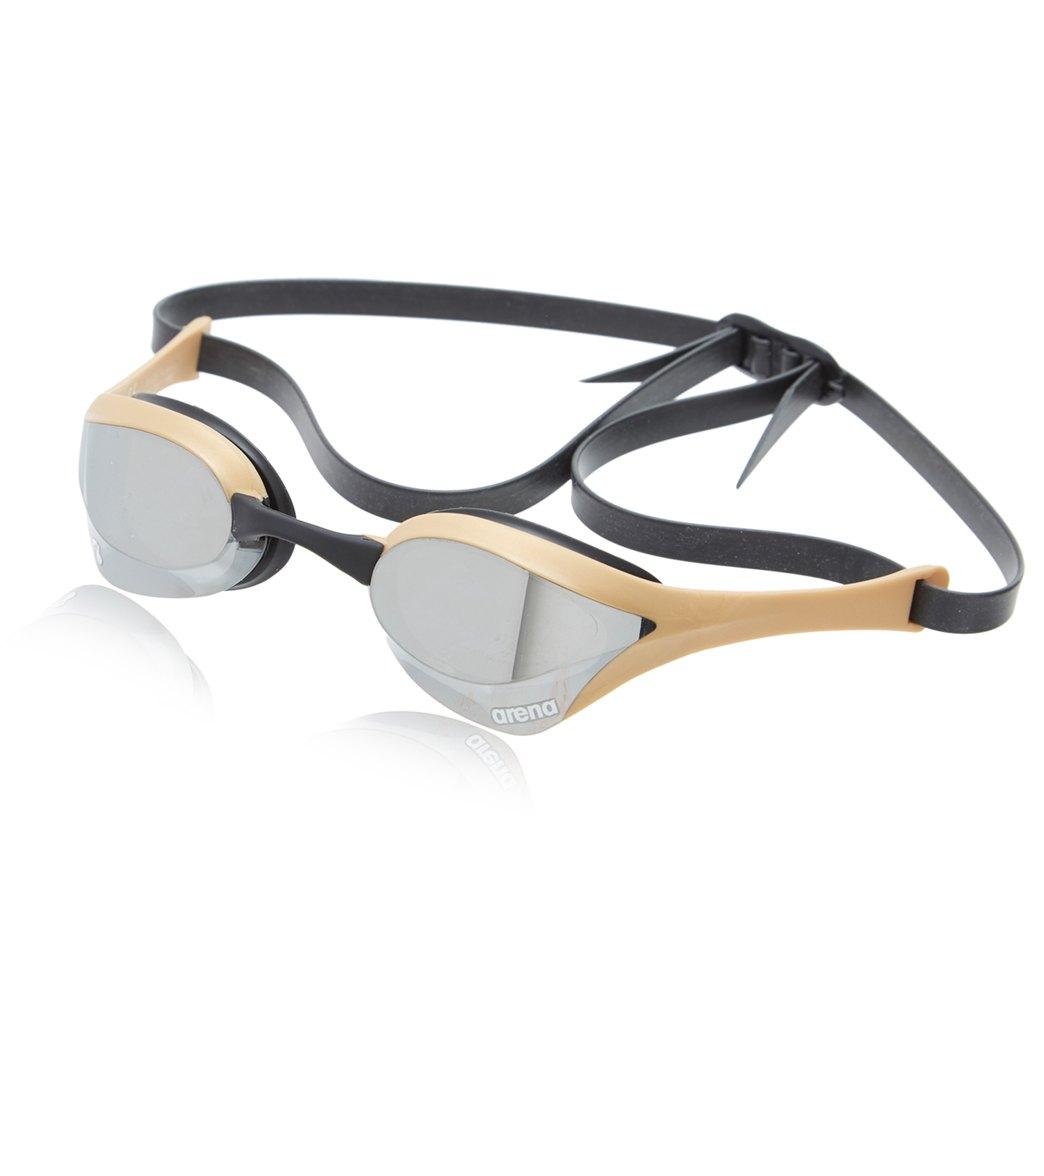 shop select for genuine nice cheap Arena Cobra Ultra Swipe Mirrored Goggles